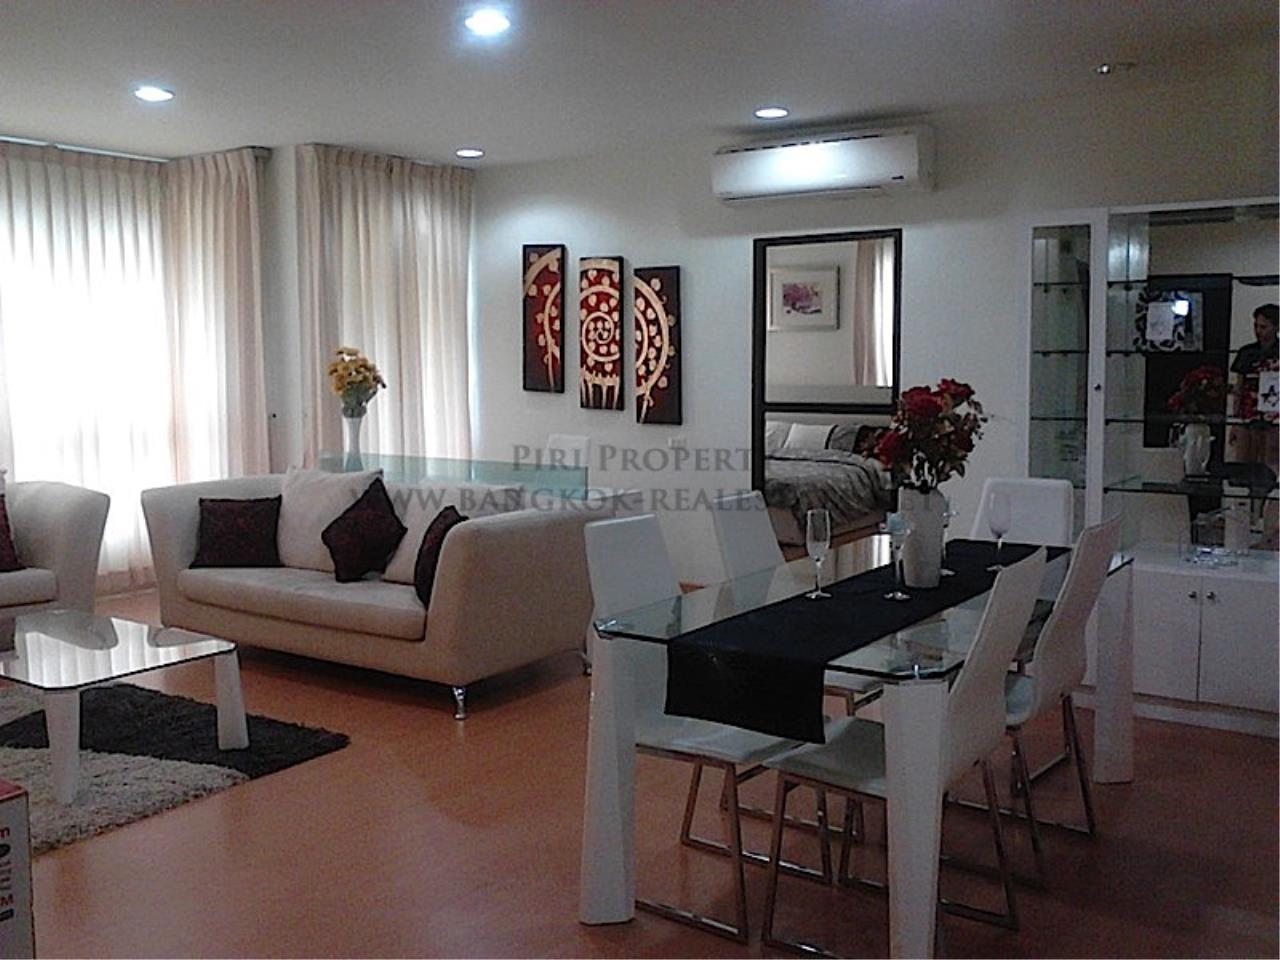 Piri Property Agency's The Address 42 - Spacious 2 Bedroom Unit 1